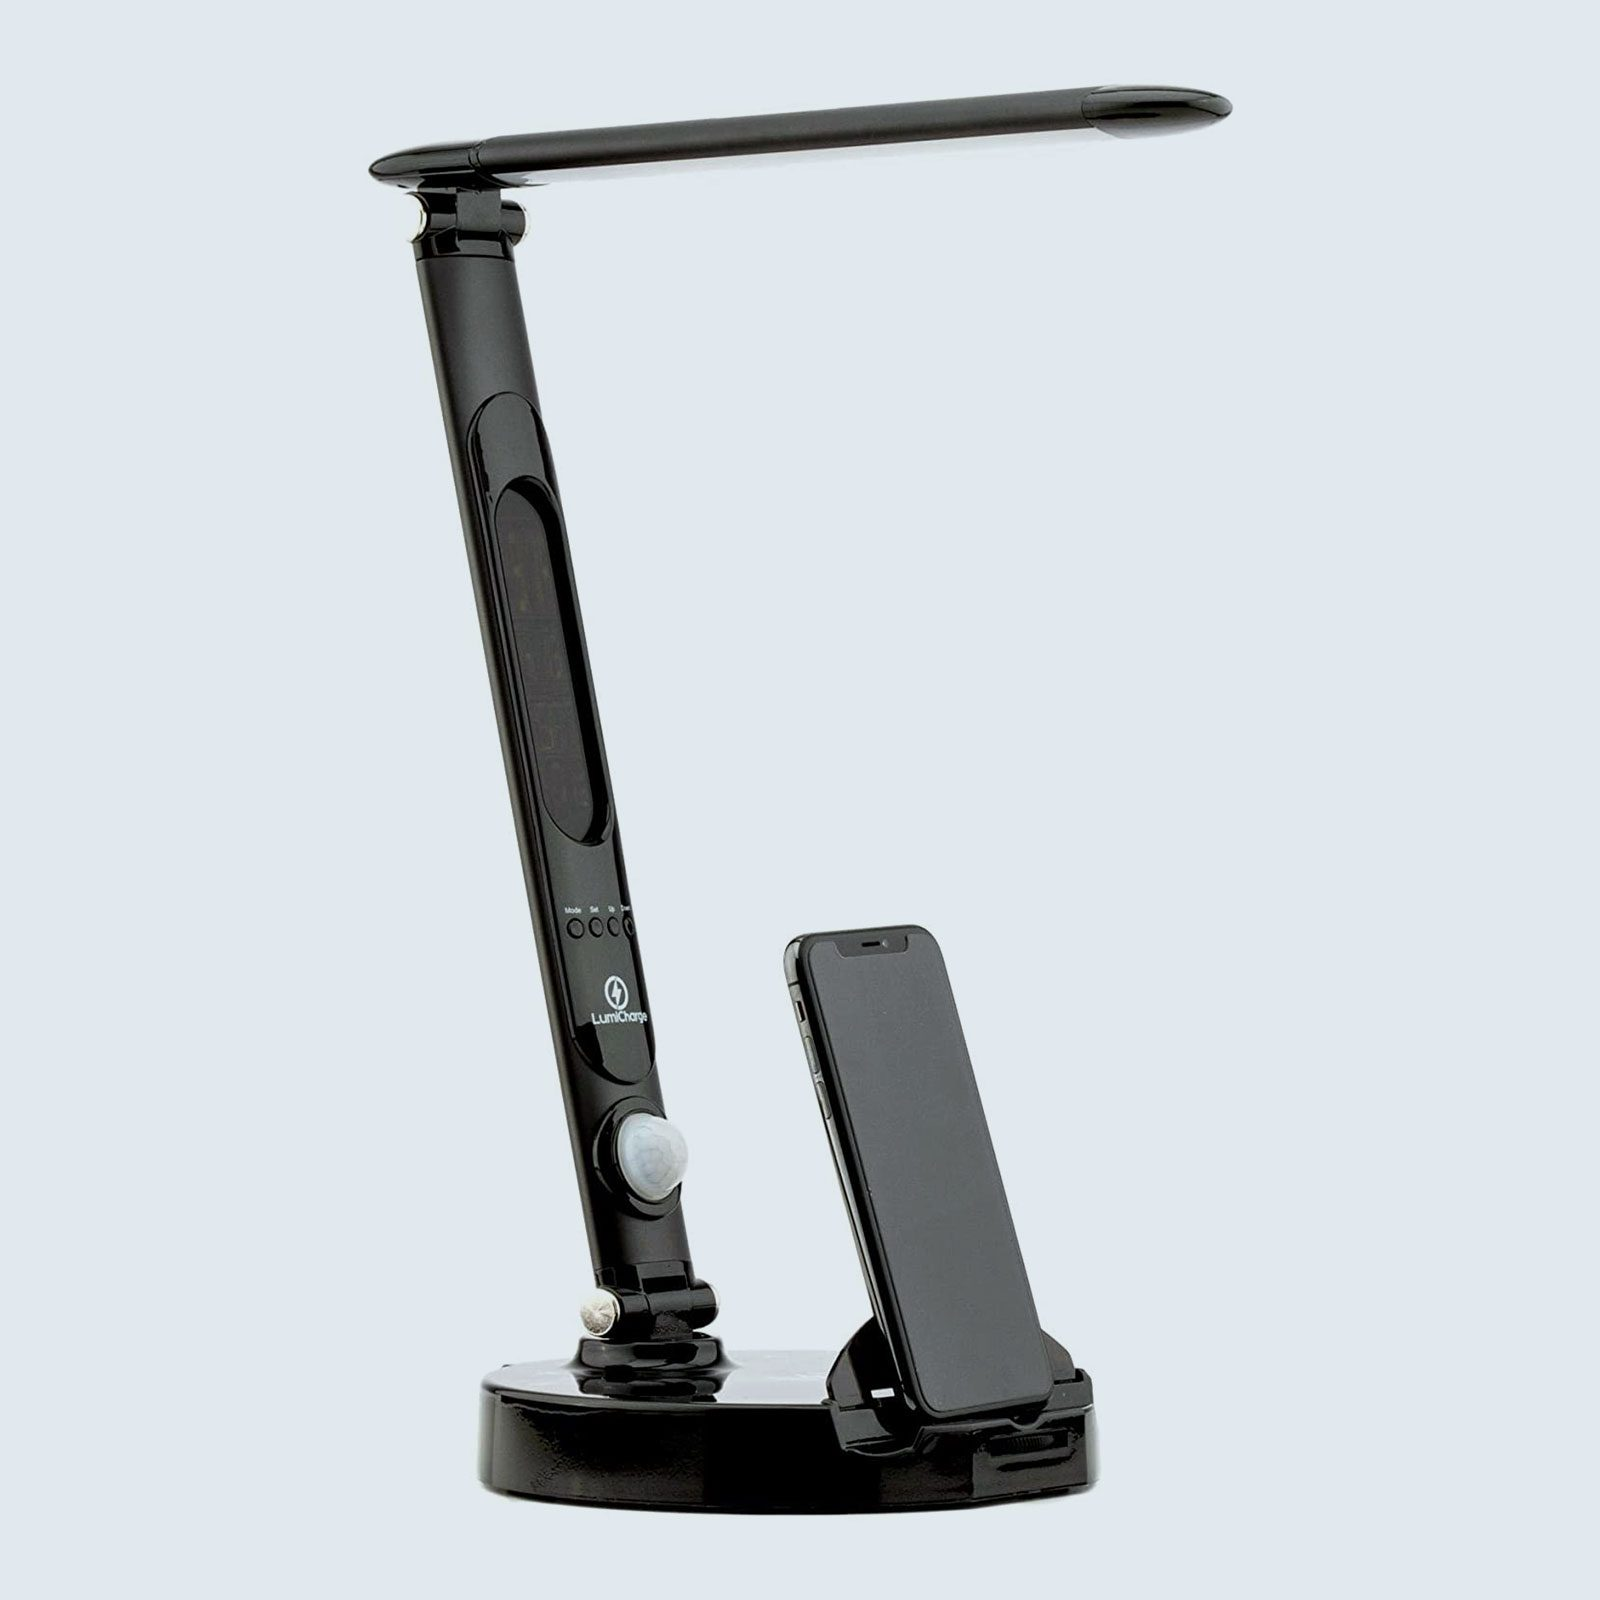 LumiCharge Smart Desk Lamp and Universal Phone Charging Dock